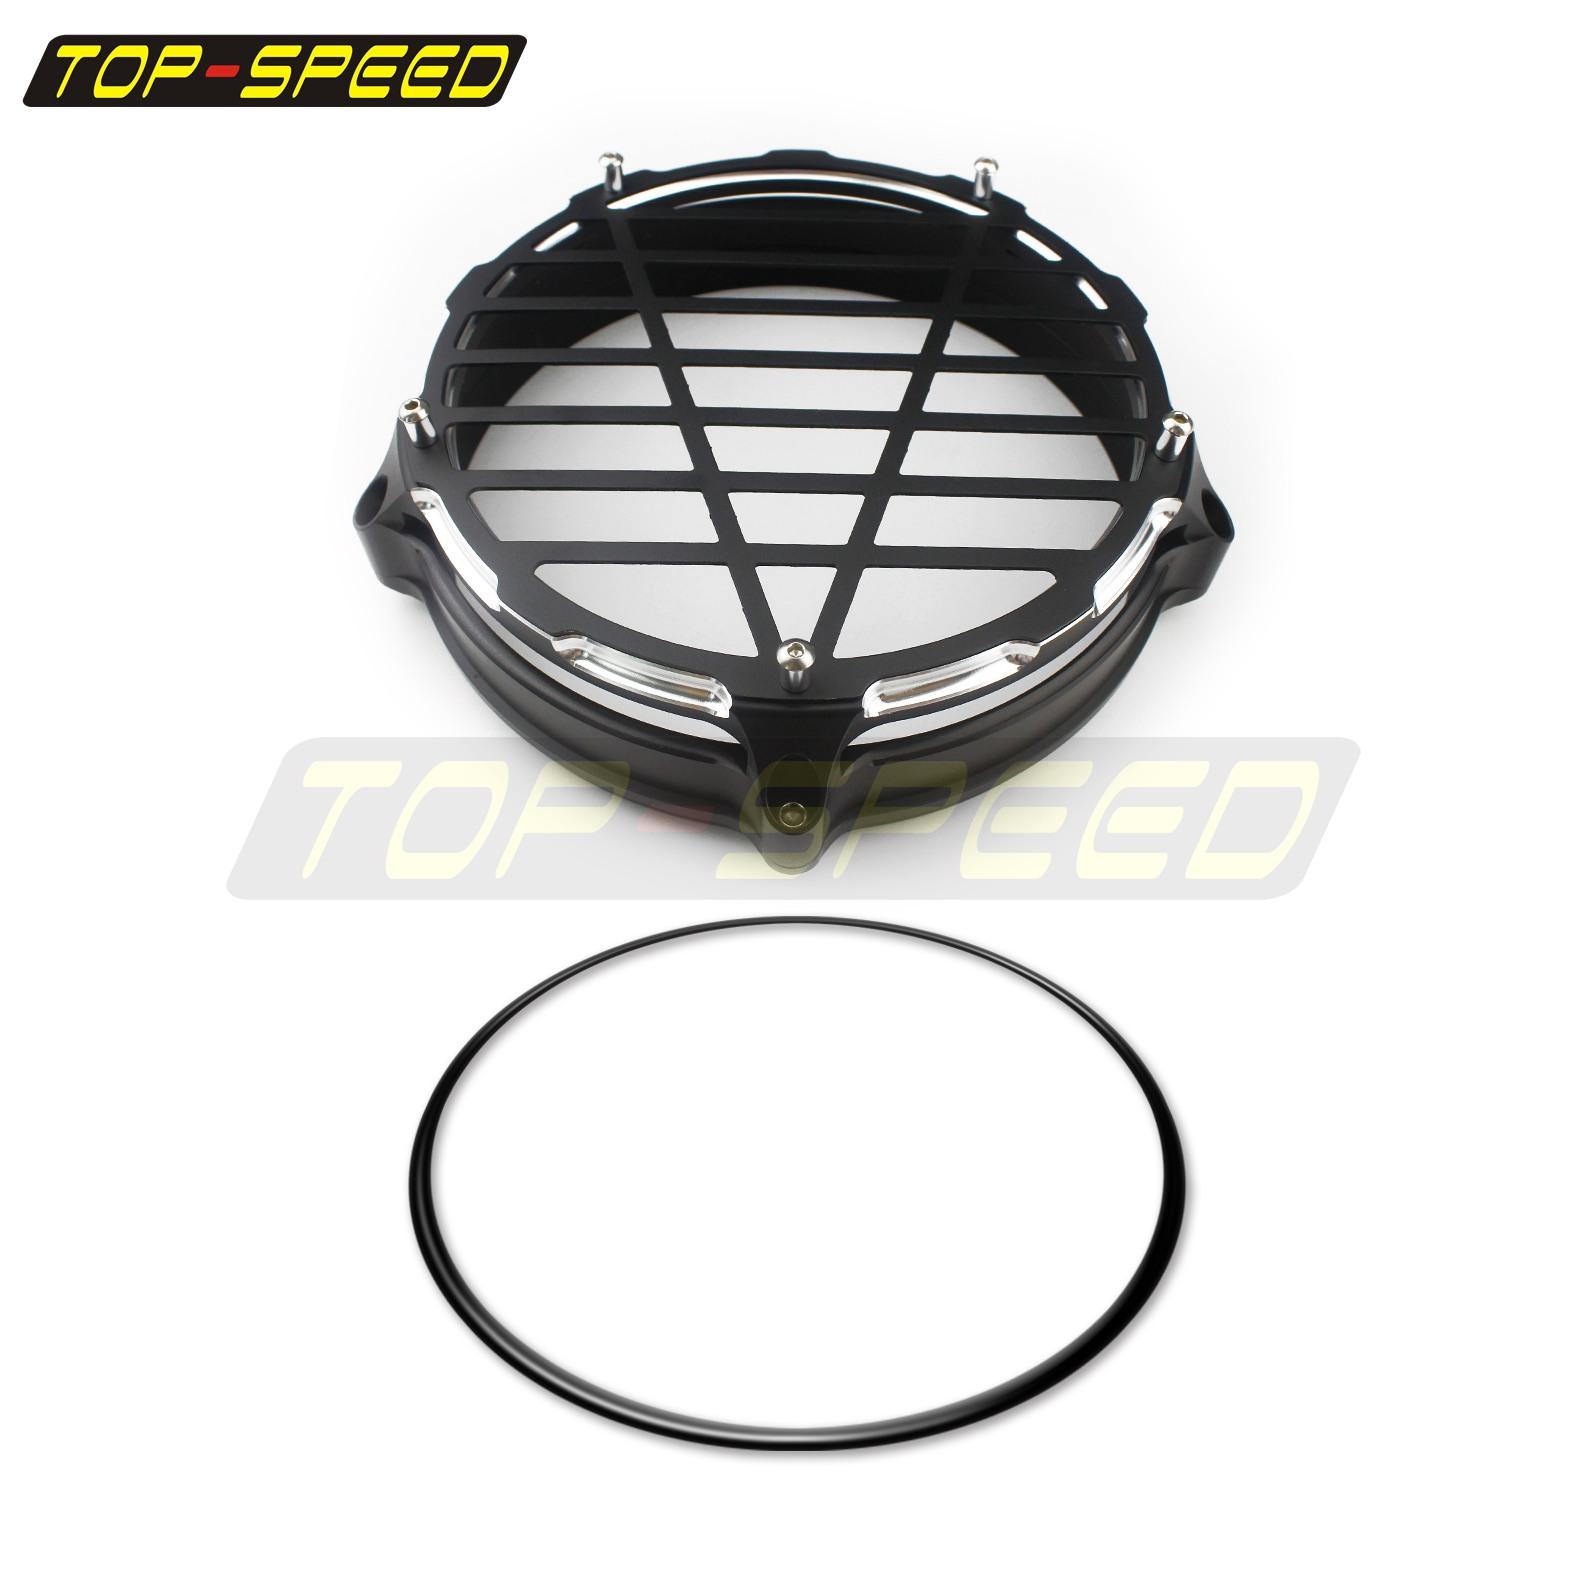 Aluminum Motorcycle Headlight Bezel Trim Ring For BMW R nine T 2014-2019 Black